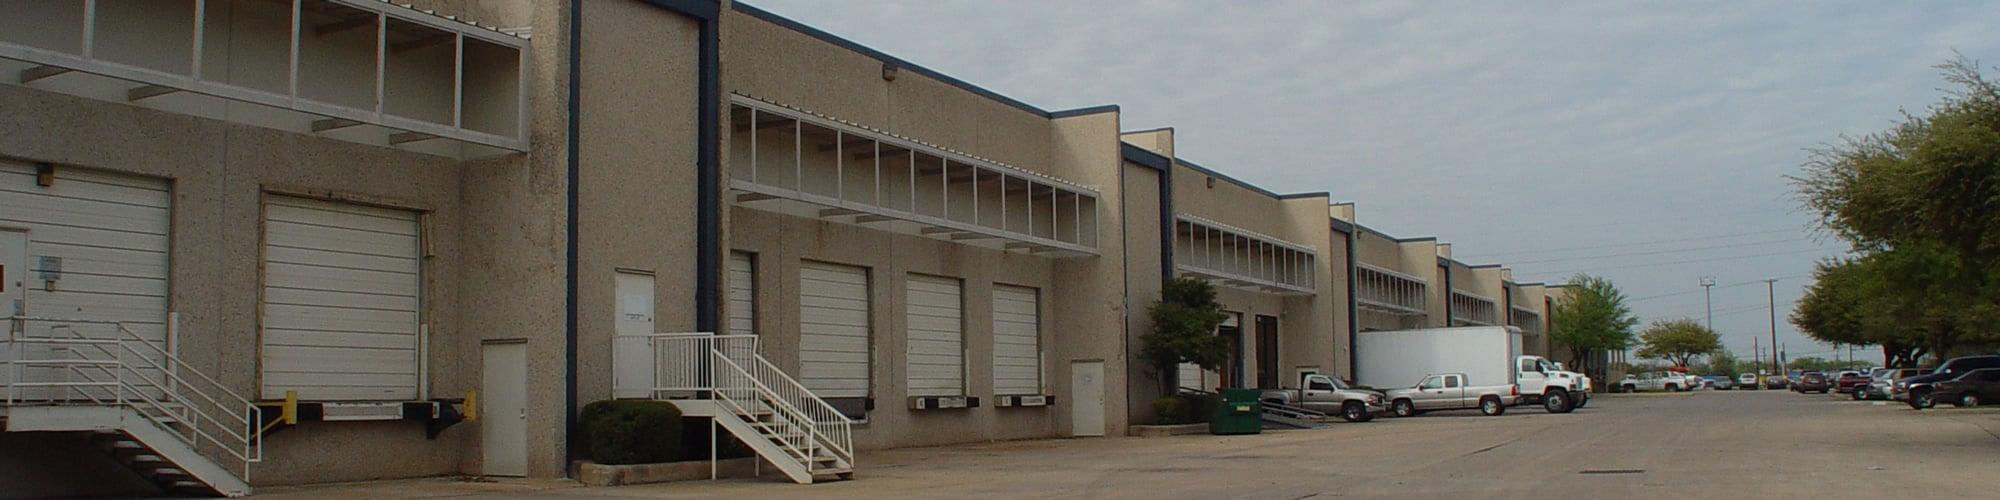 Ben White 6 Exterior | 3910 S. Industrial Boulevard in Austin, Texas